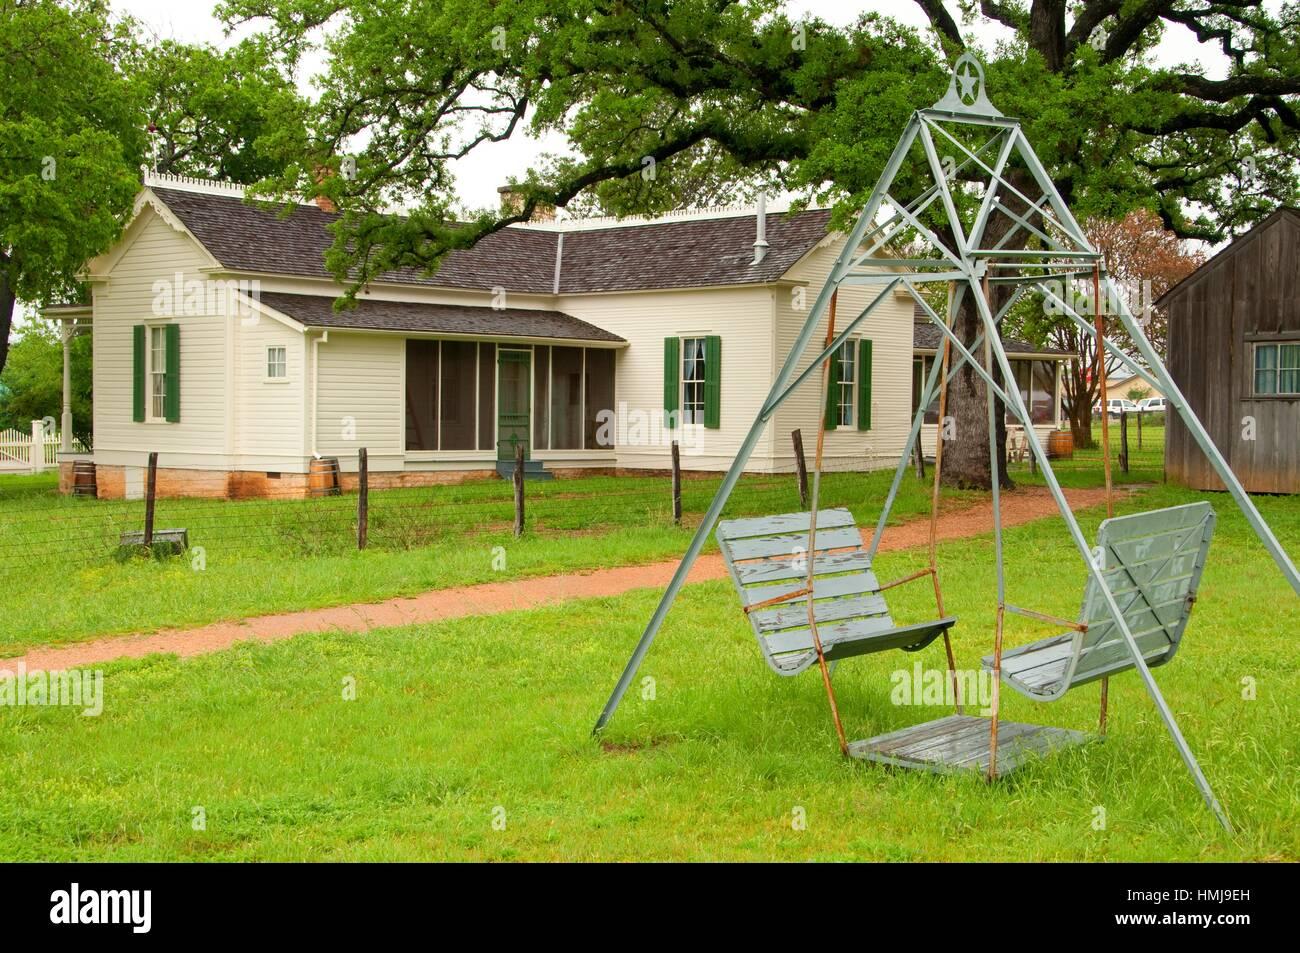 LBJ Boyhood Home with swing, Lyndon B. Johnson National Historical Park, Texas. Stock Photo